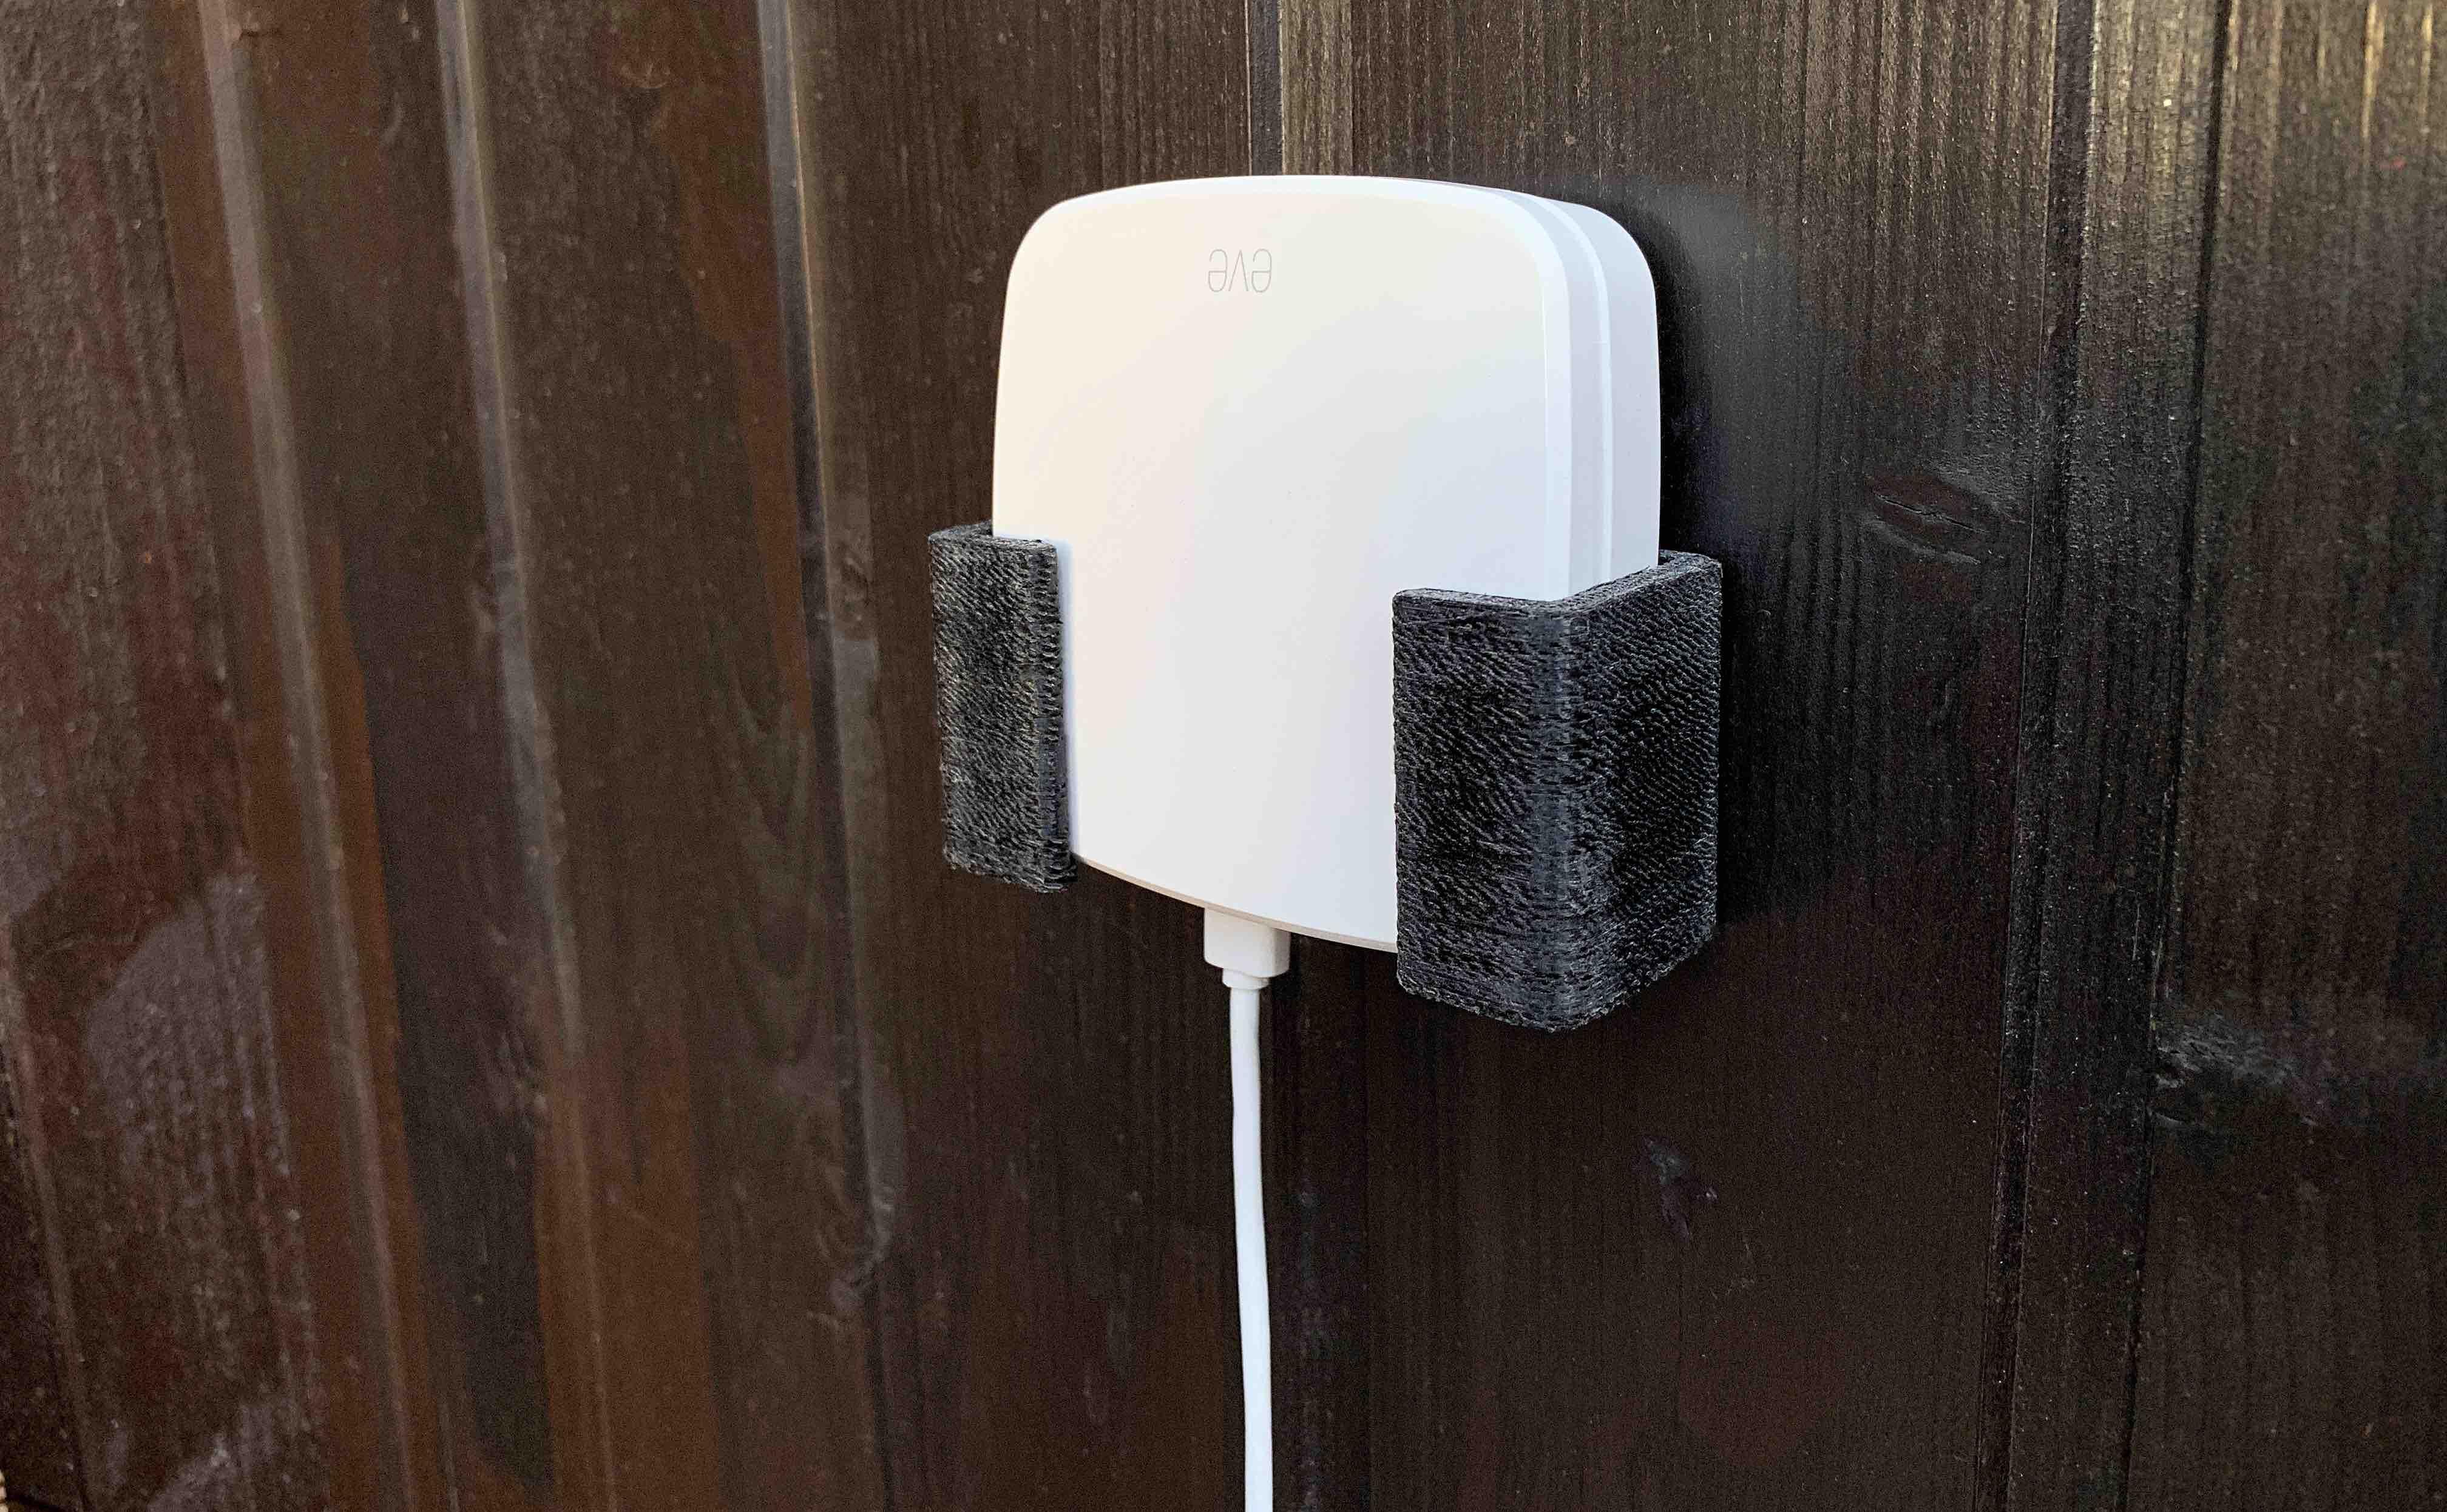 Eve_Extend_Bluetooth_Repeater_HomeKit_WiFi_WLAN_Gateway_Review7 Eve Extend von Eve - Bluetoothreichweite unter Apple HomeKit ins WiFi verlagern